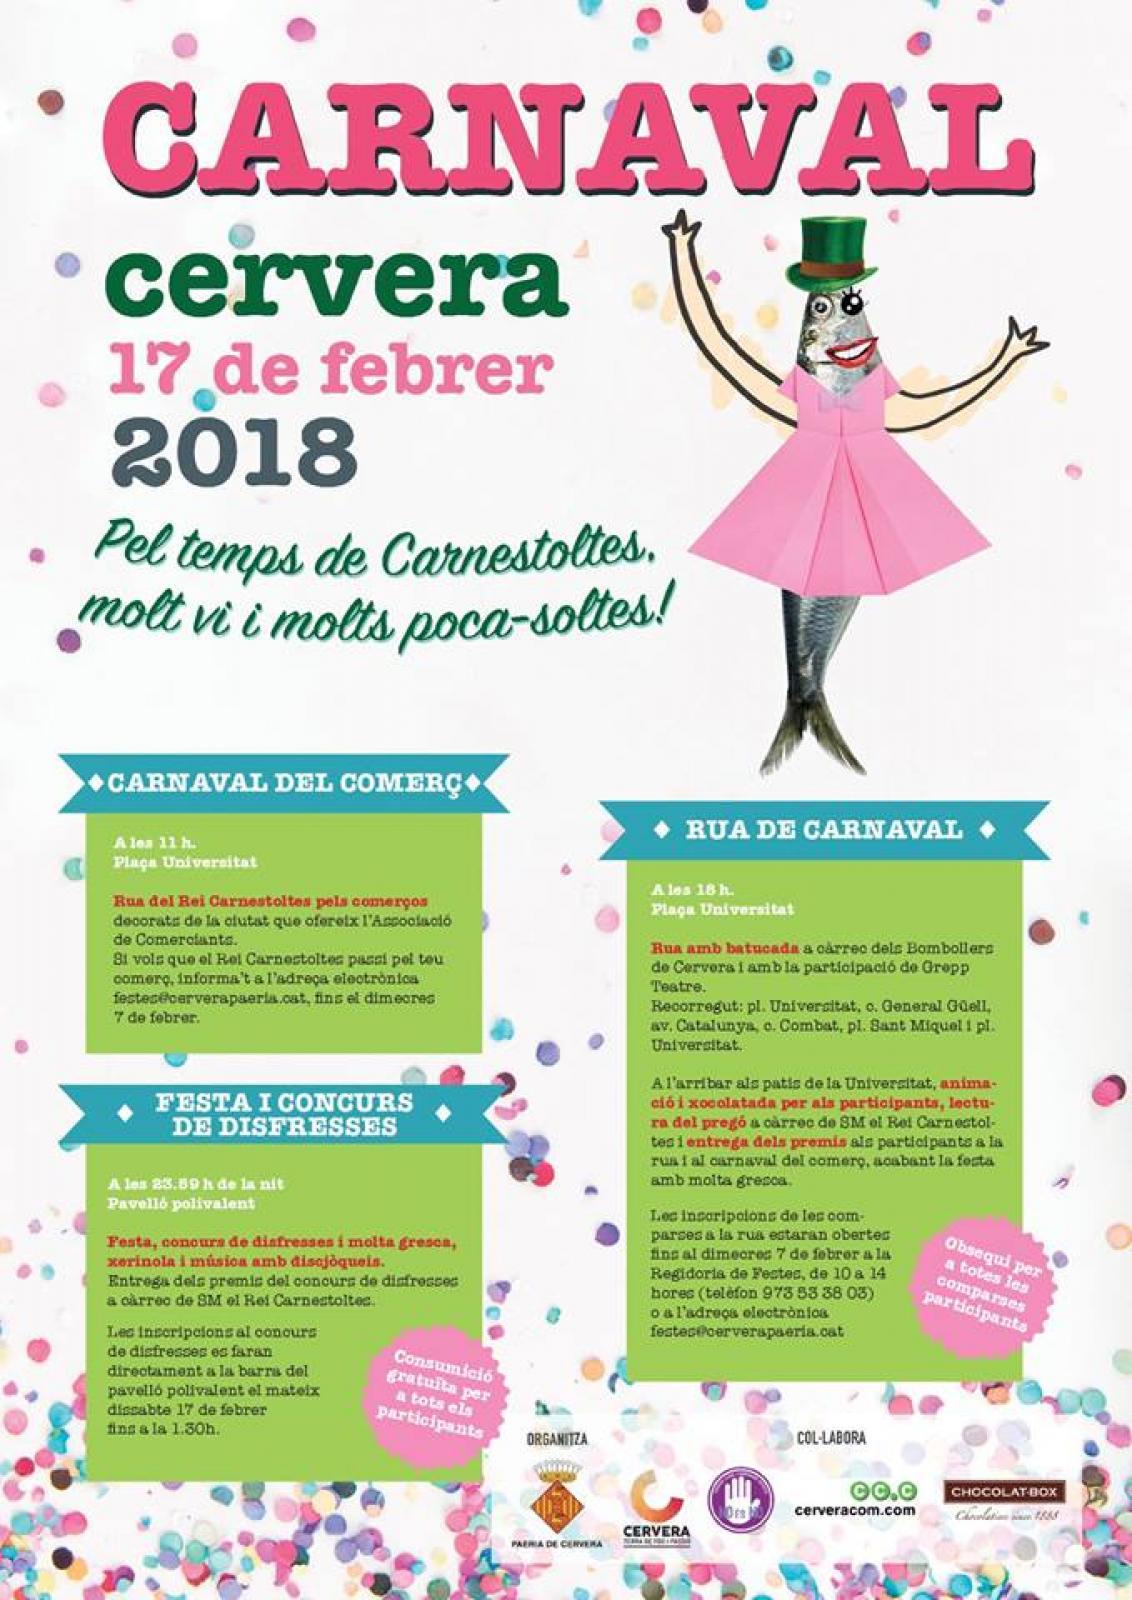 Carnaval Cervera 2018